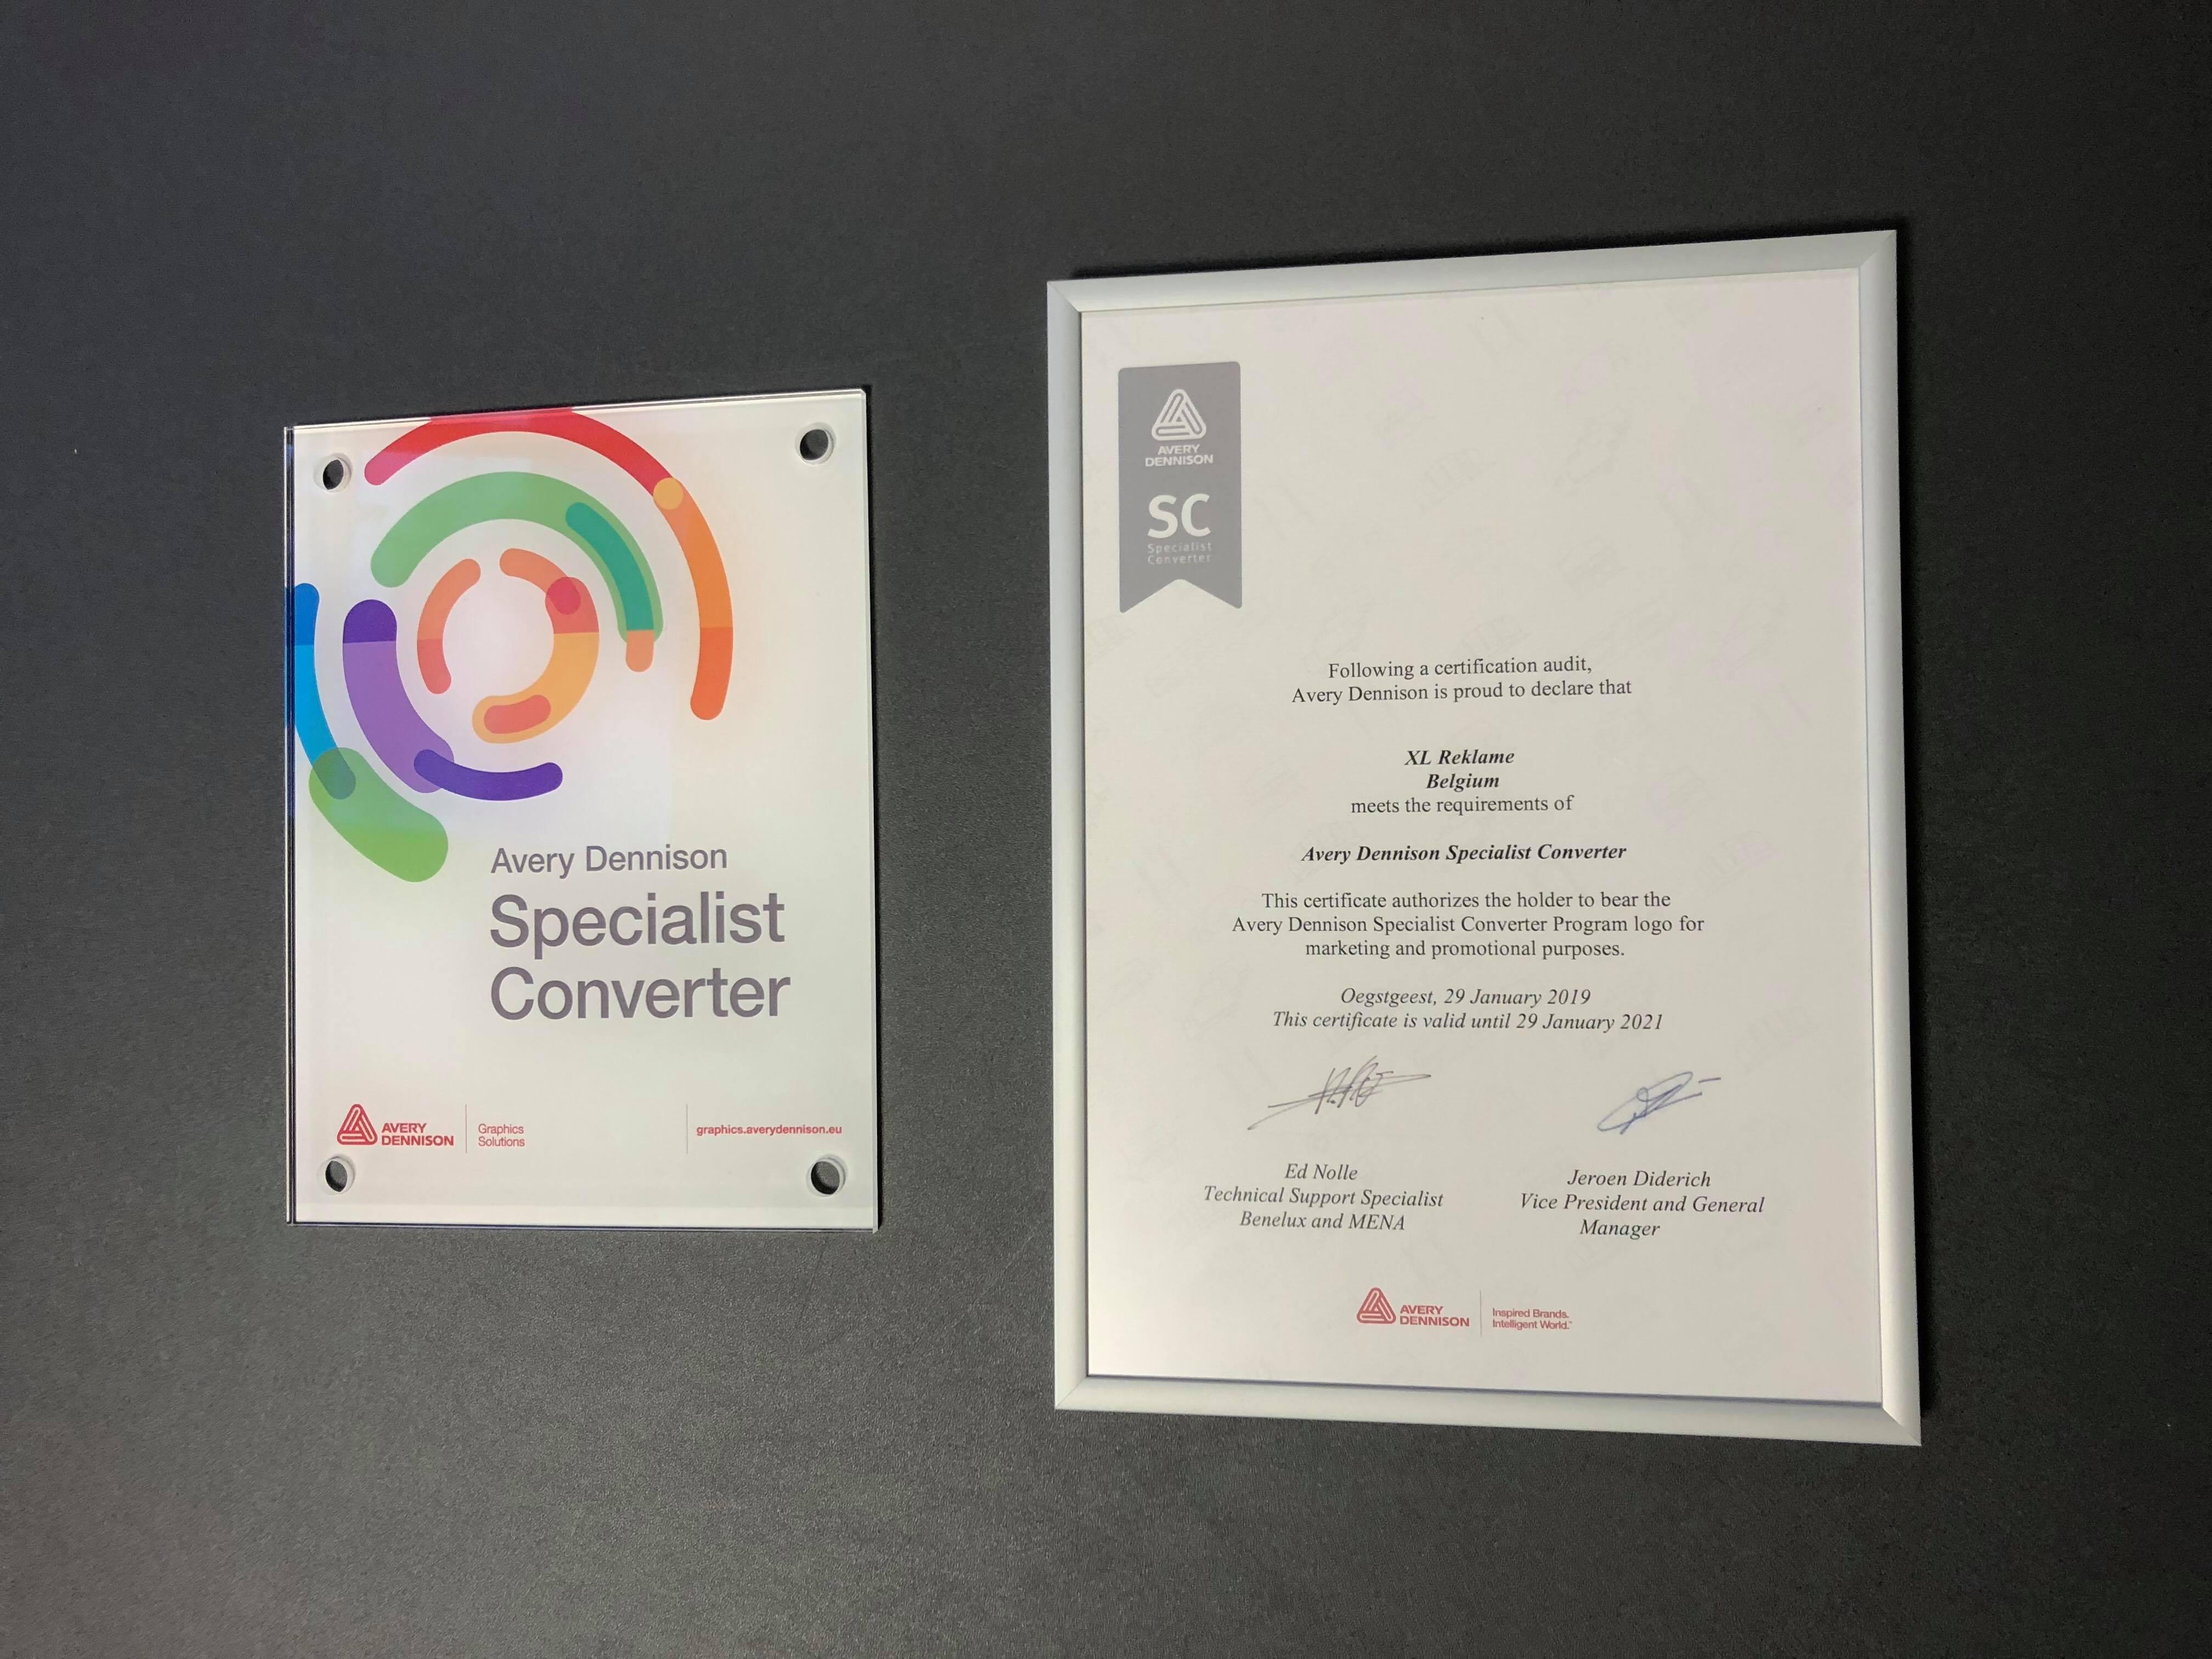 Certificaten Avery Dennison Specialist Converter